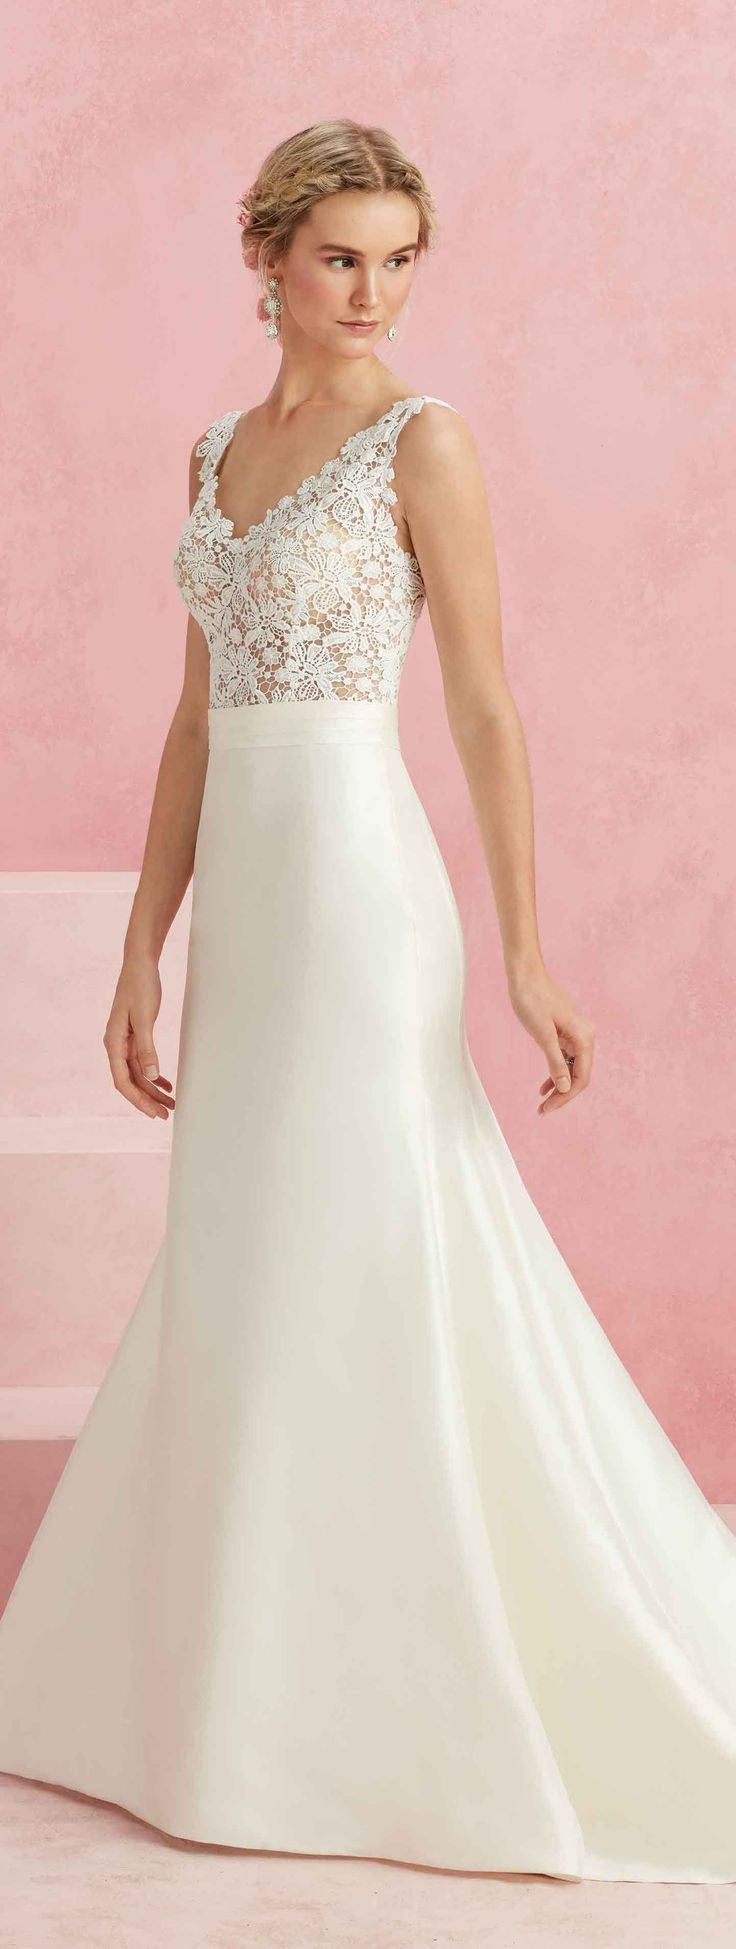 1615 mejores imágenes de Wedding Dresses Corset en Pinterest ...